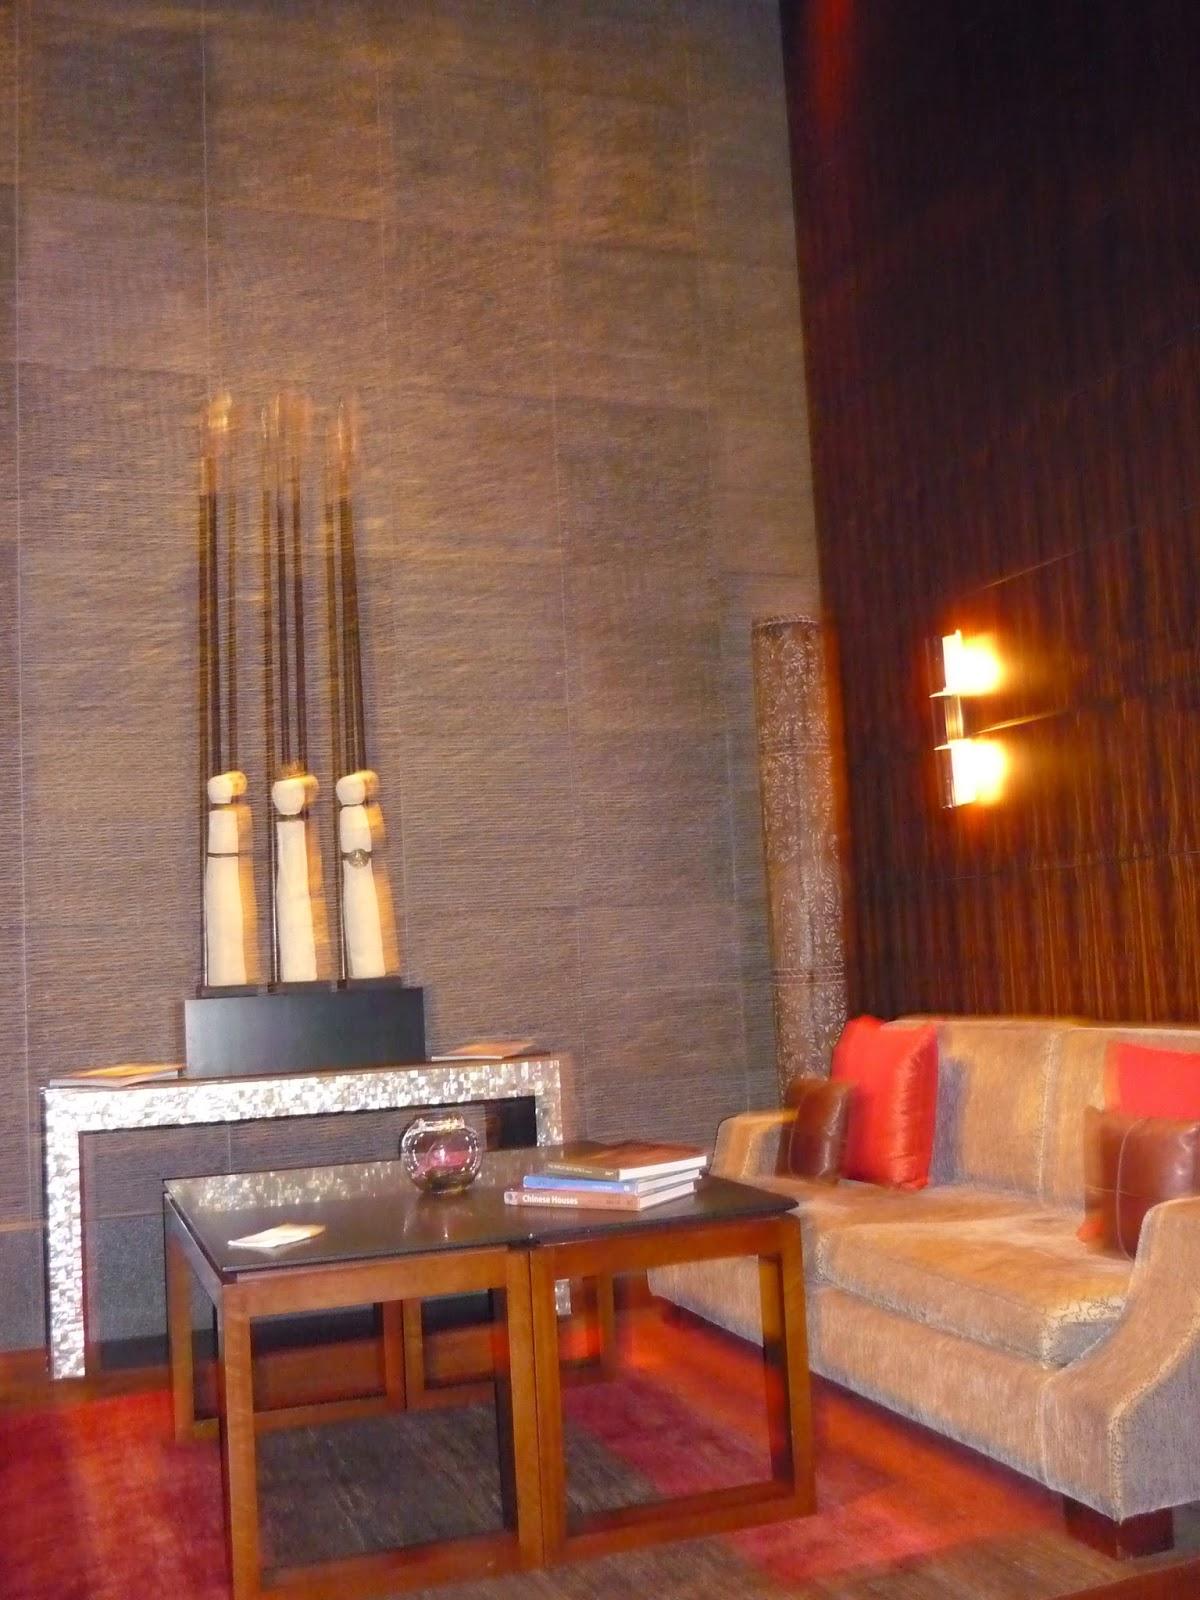 Singapore Mandarin Oriental Hotel Club